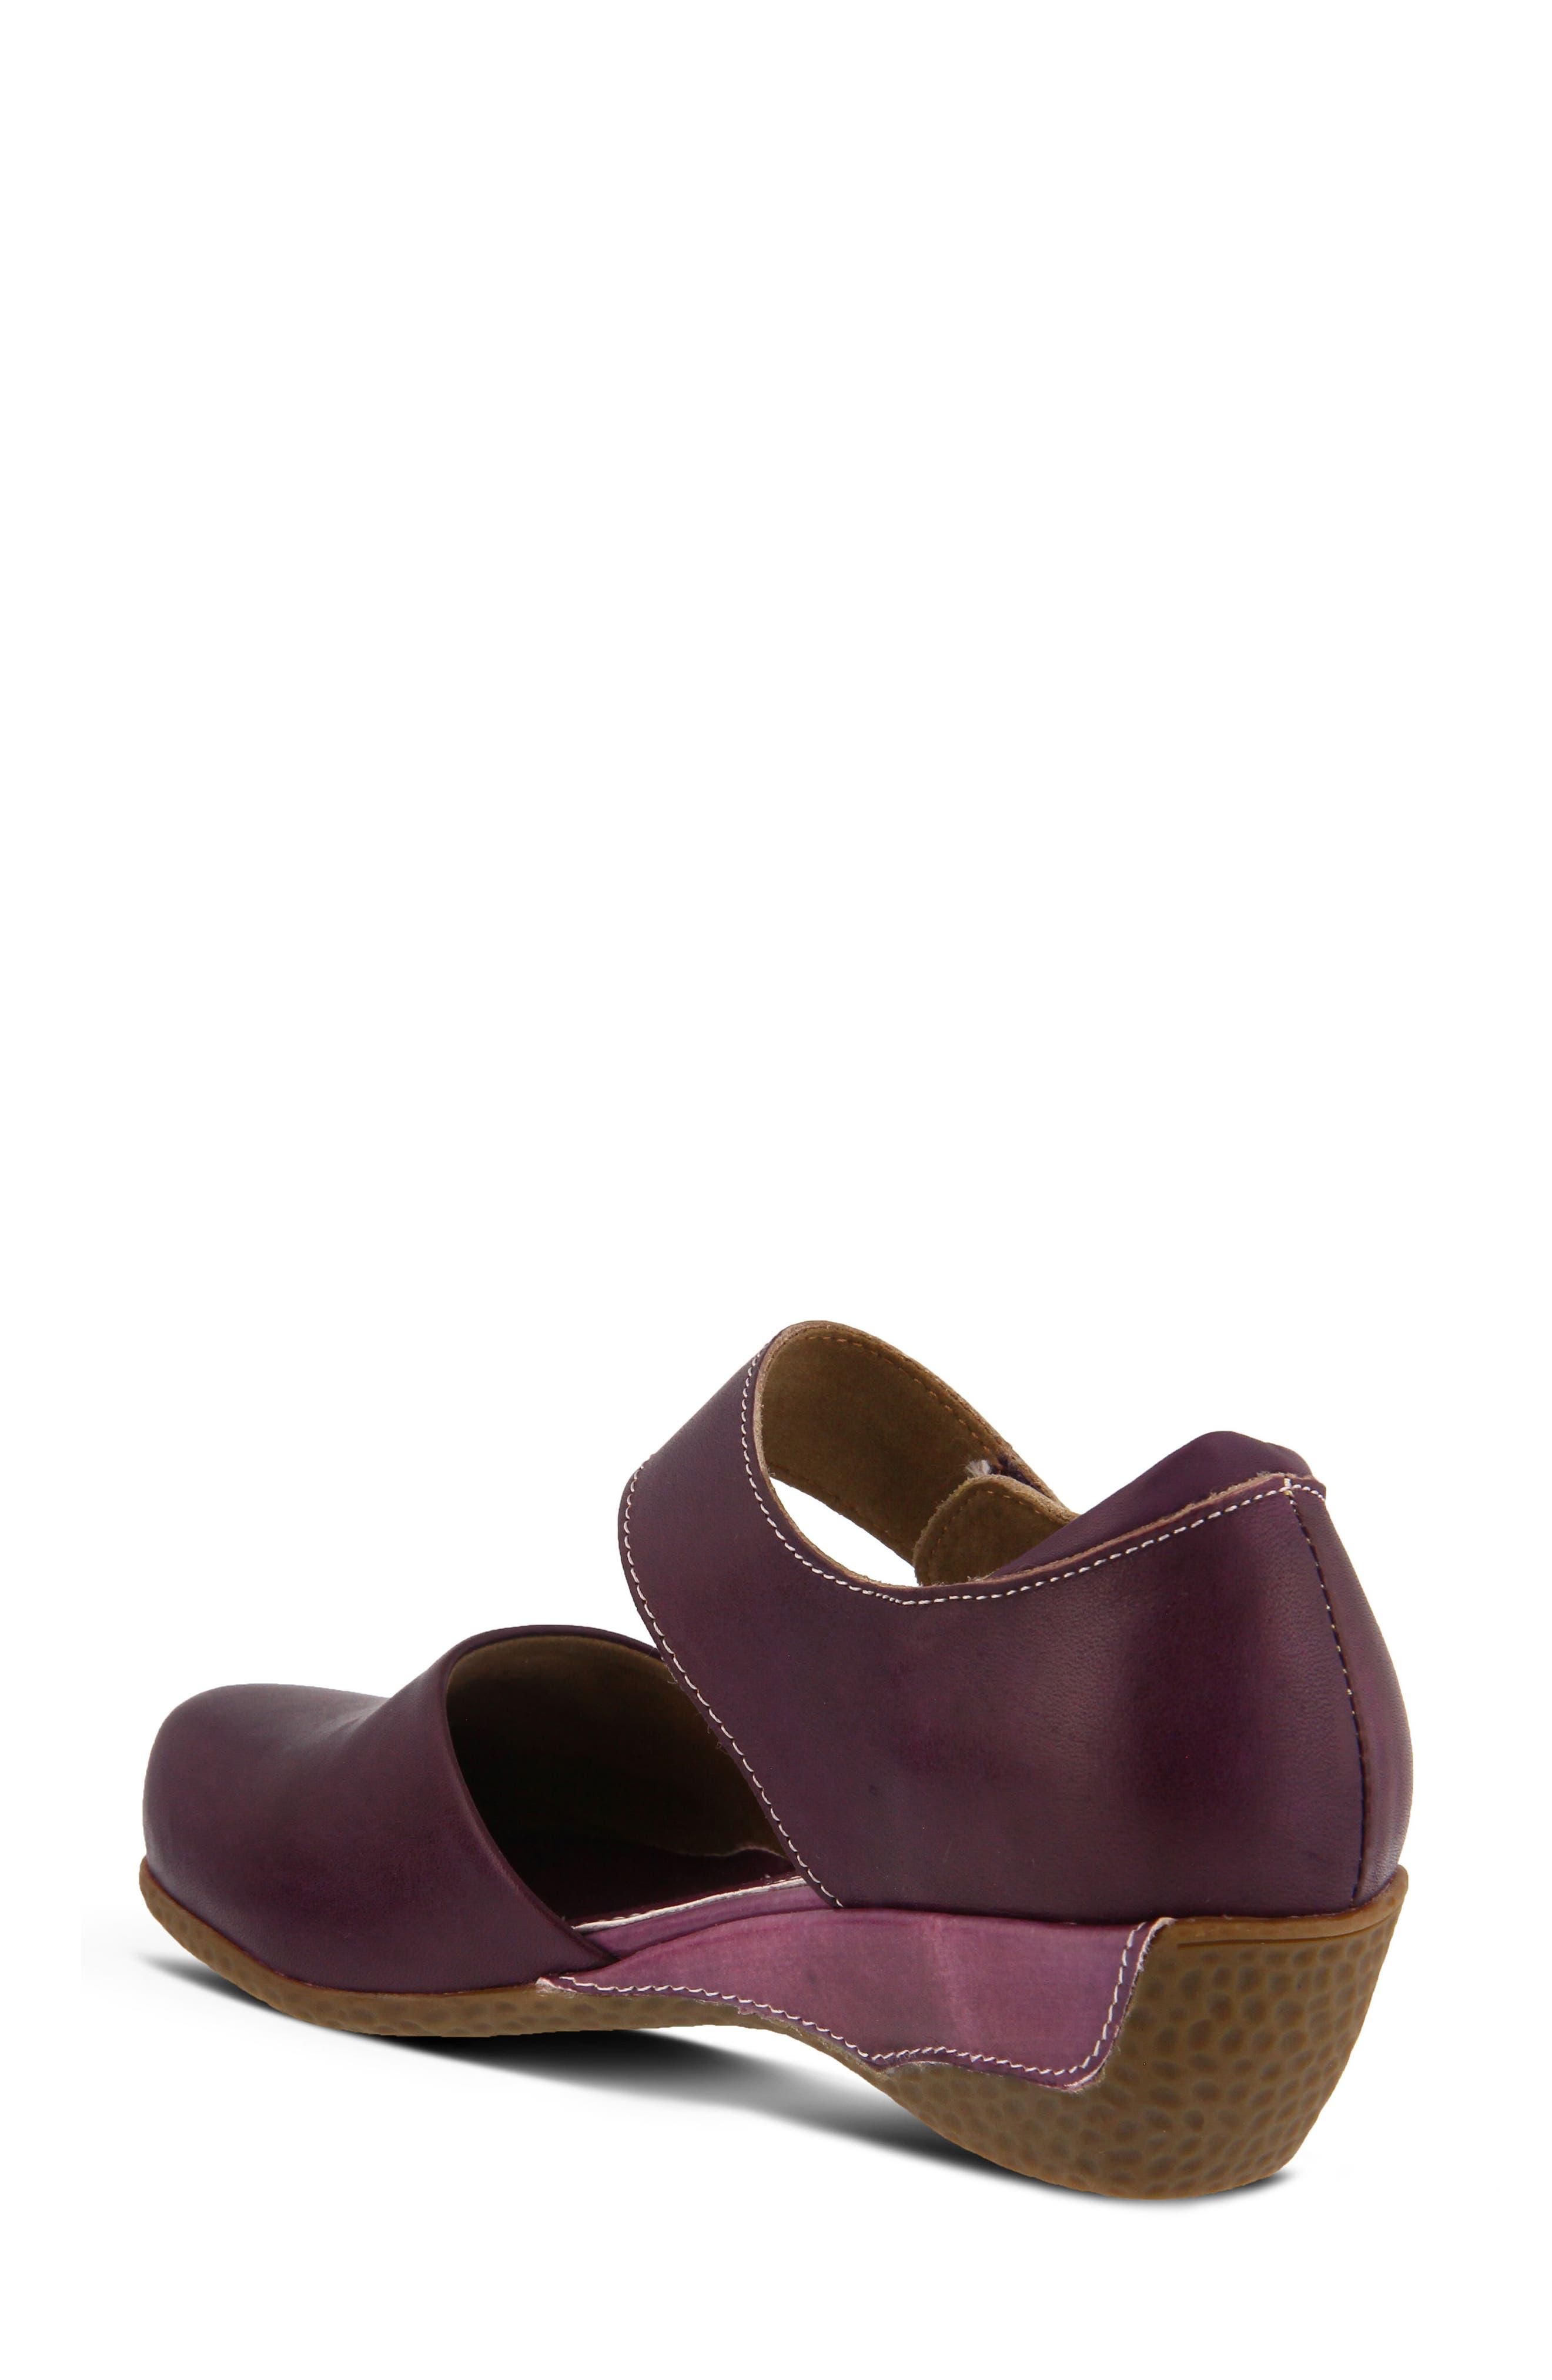 L'Artiste Gloss Mary Jane Pump,                             Alternate thumbnail 2, color,                             Purple Leather